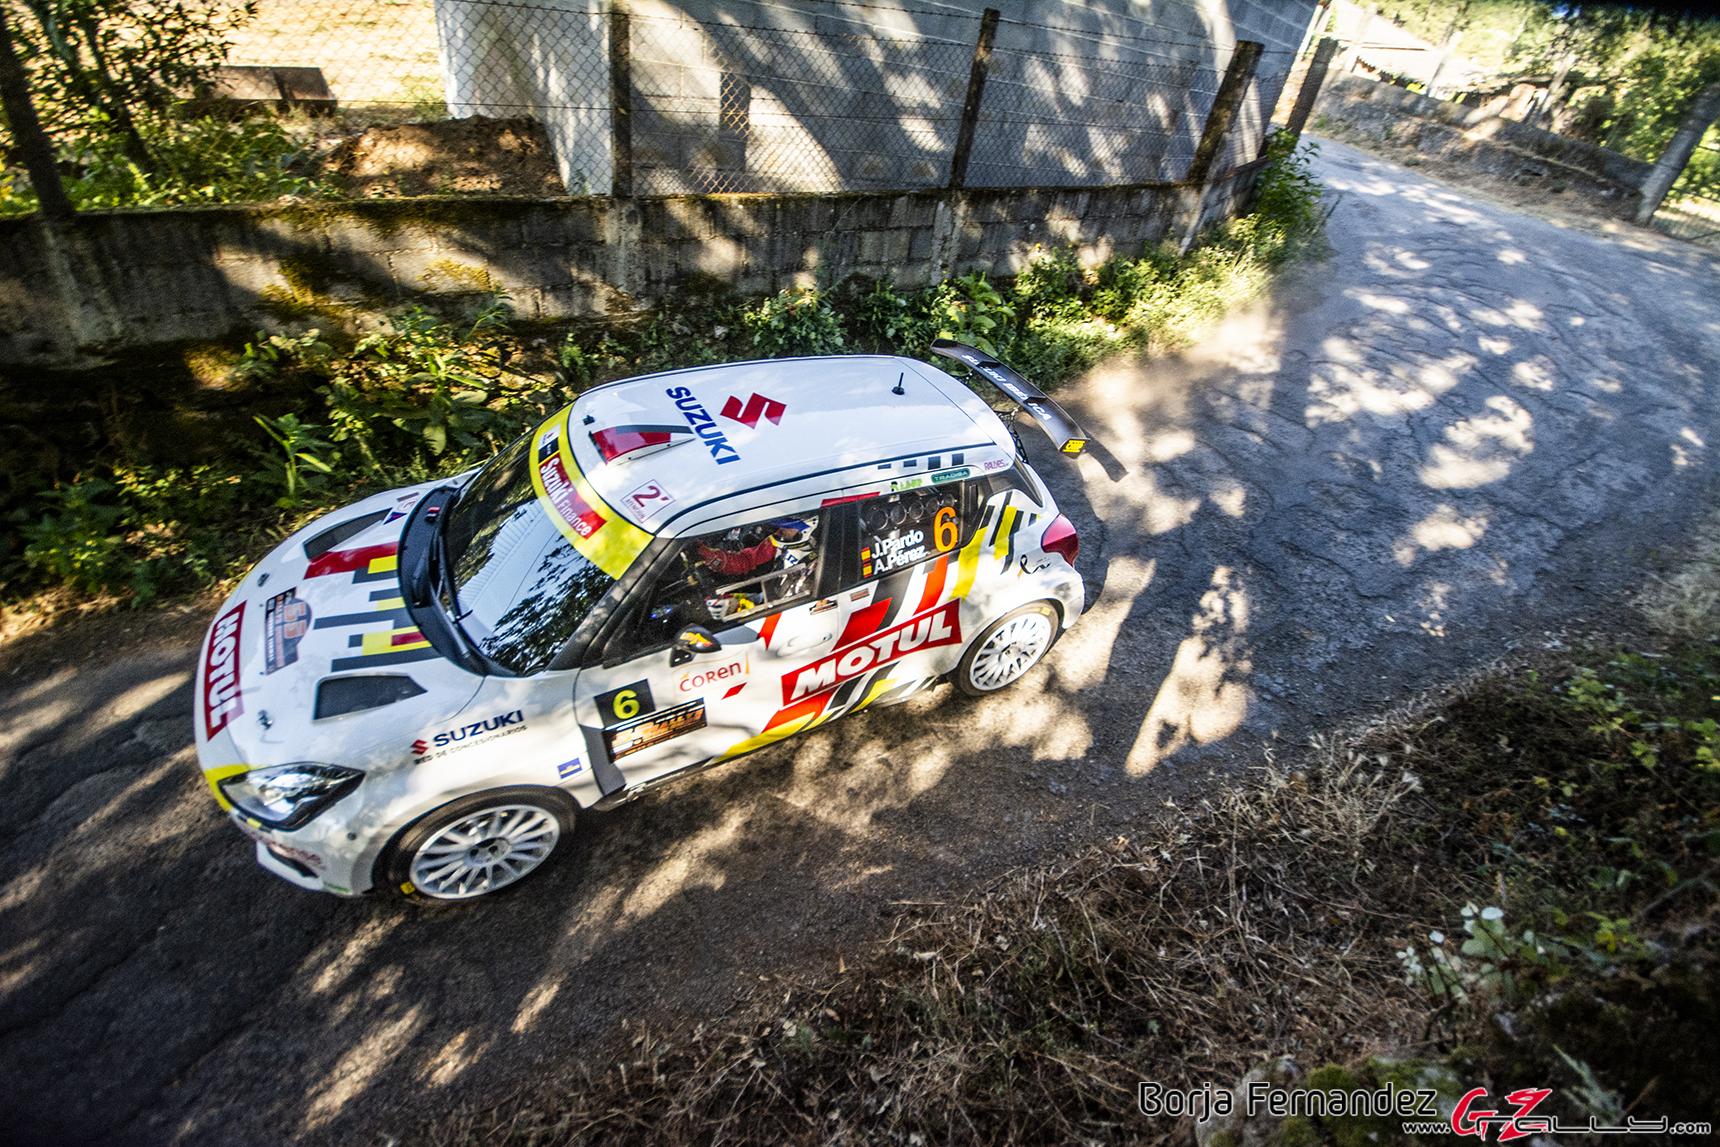 Rally de Ourense 2020 - Borja Fernandez